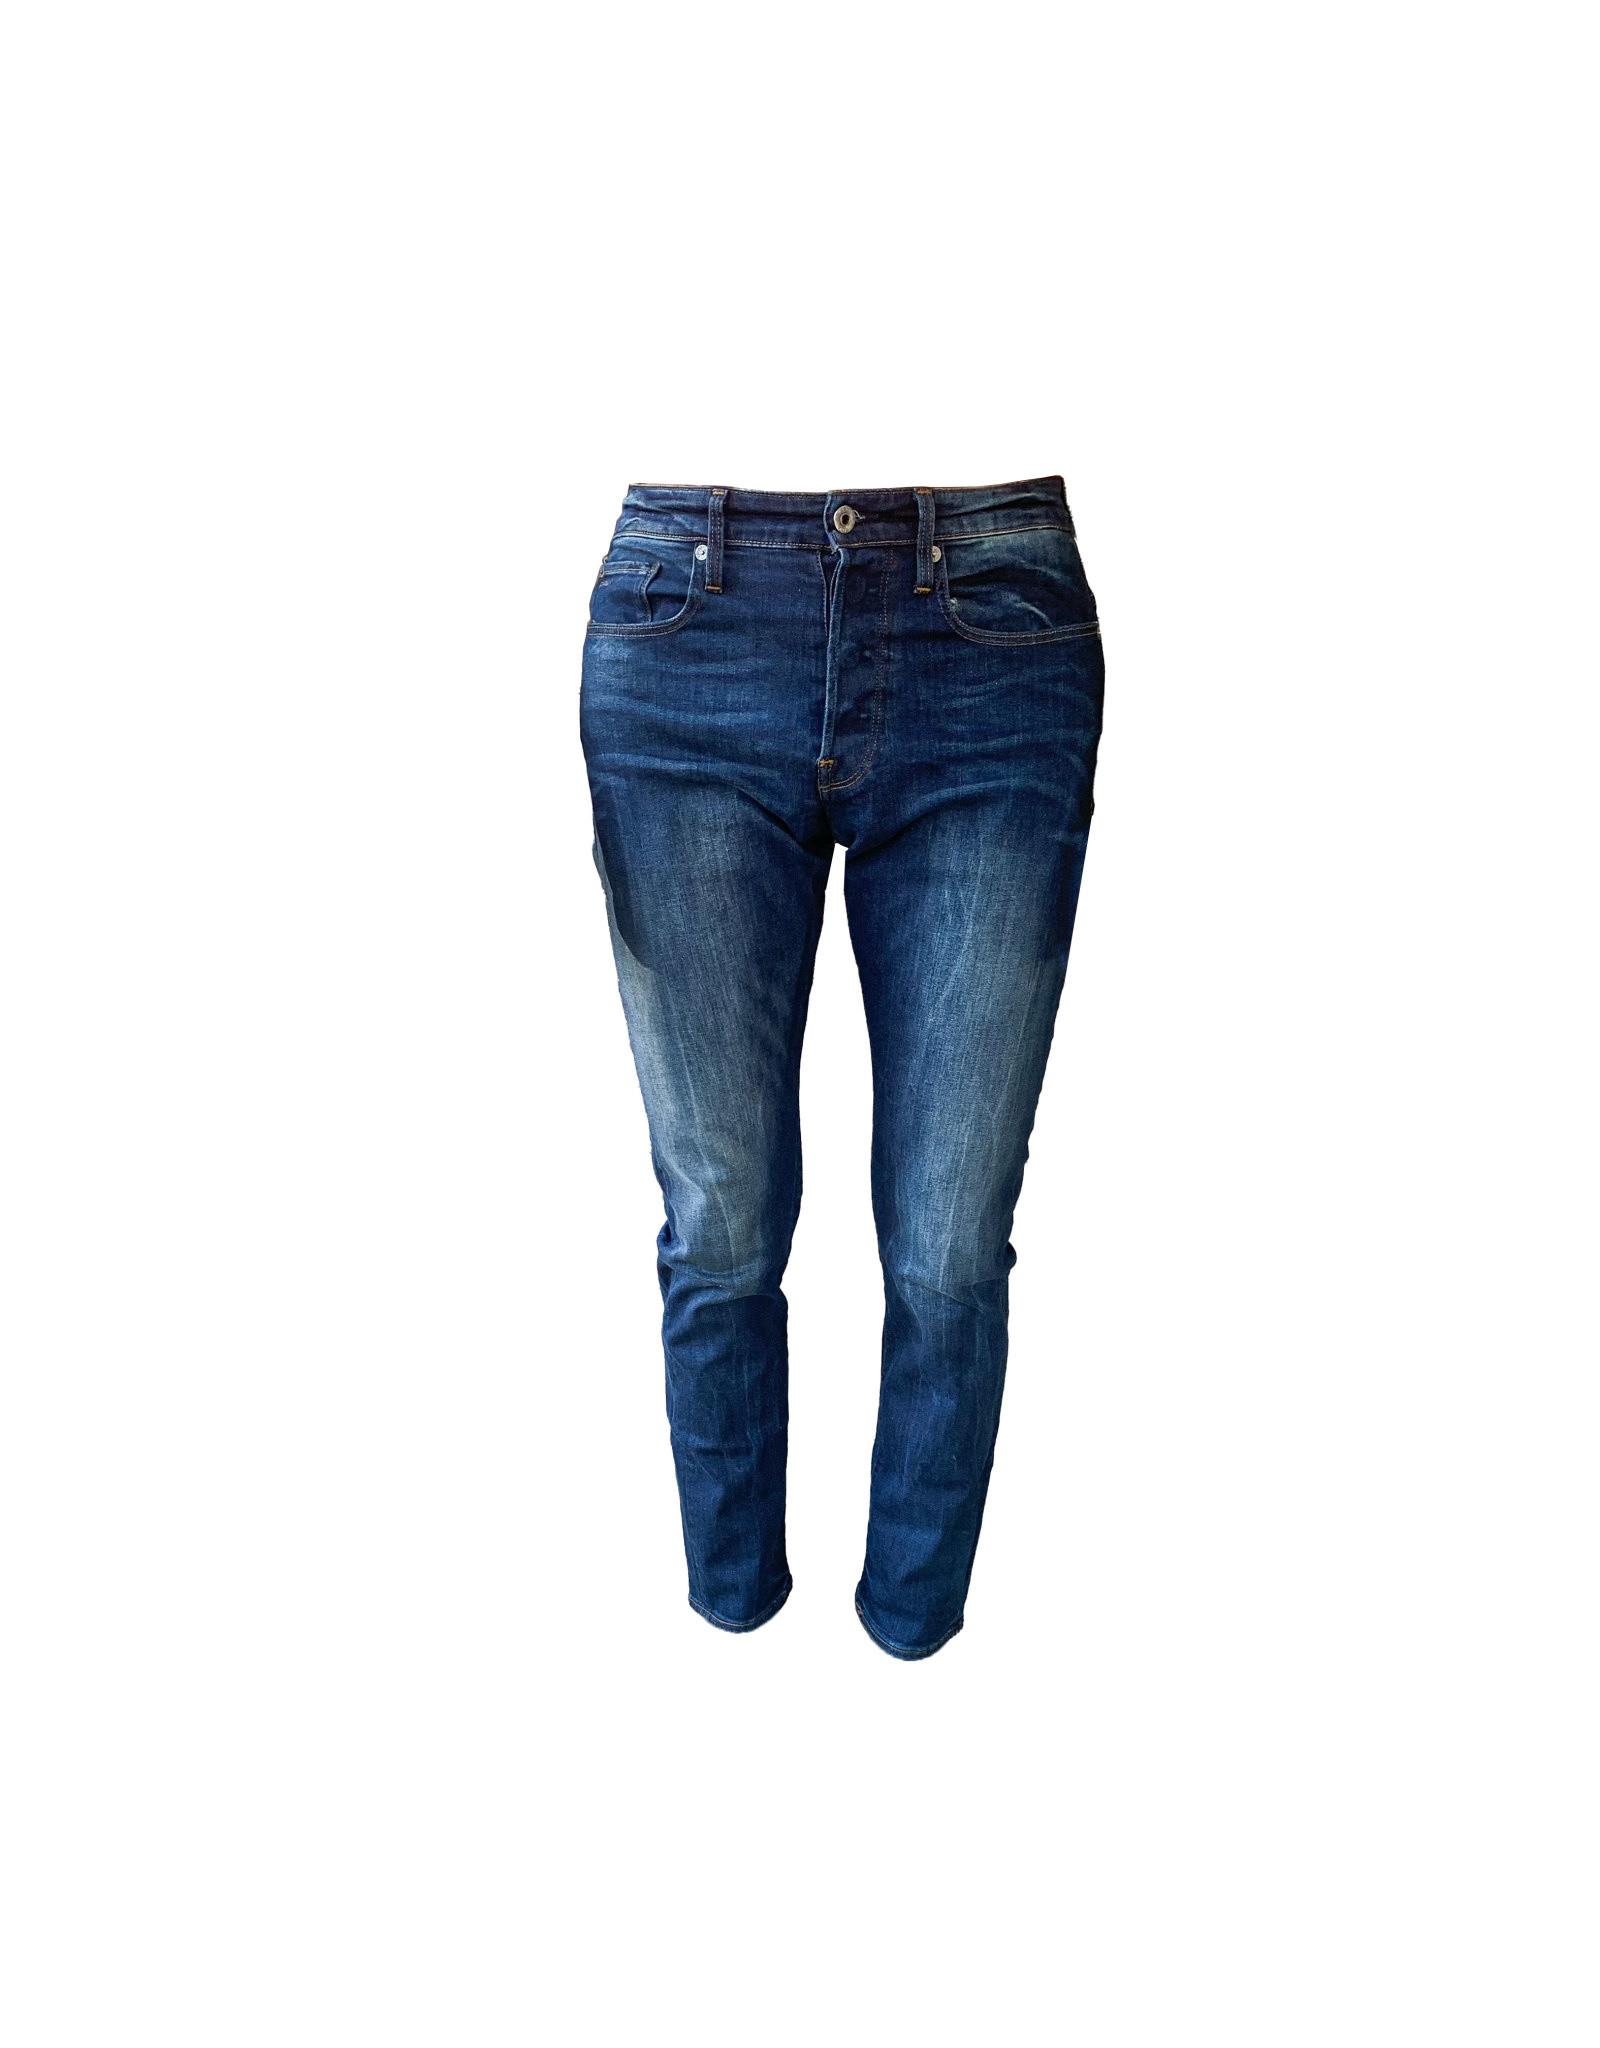 G-Star Raw RAW  3301 Straight Tapered   Jeans size  W29 L32